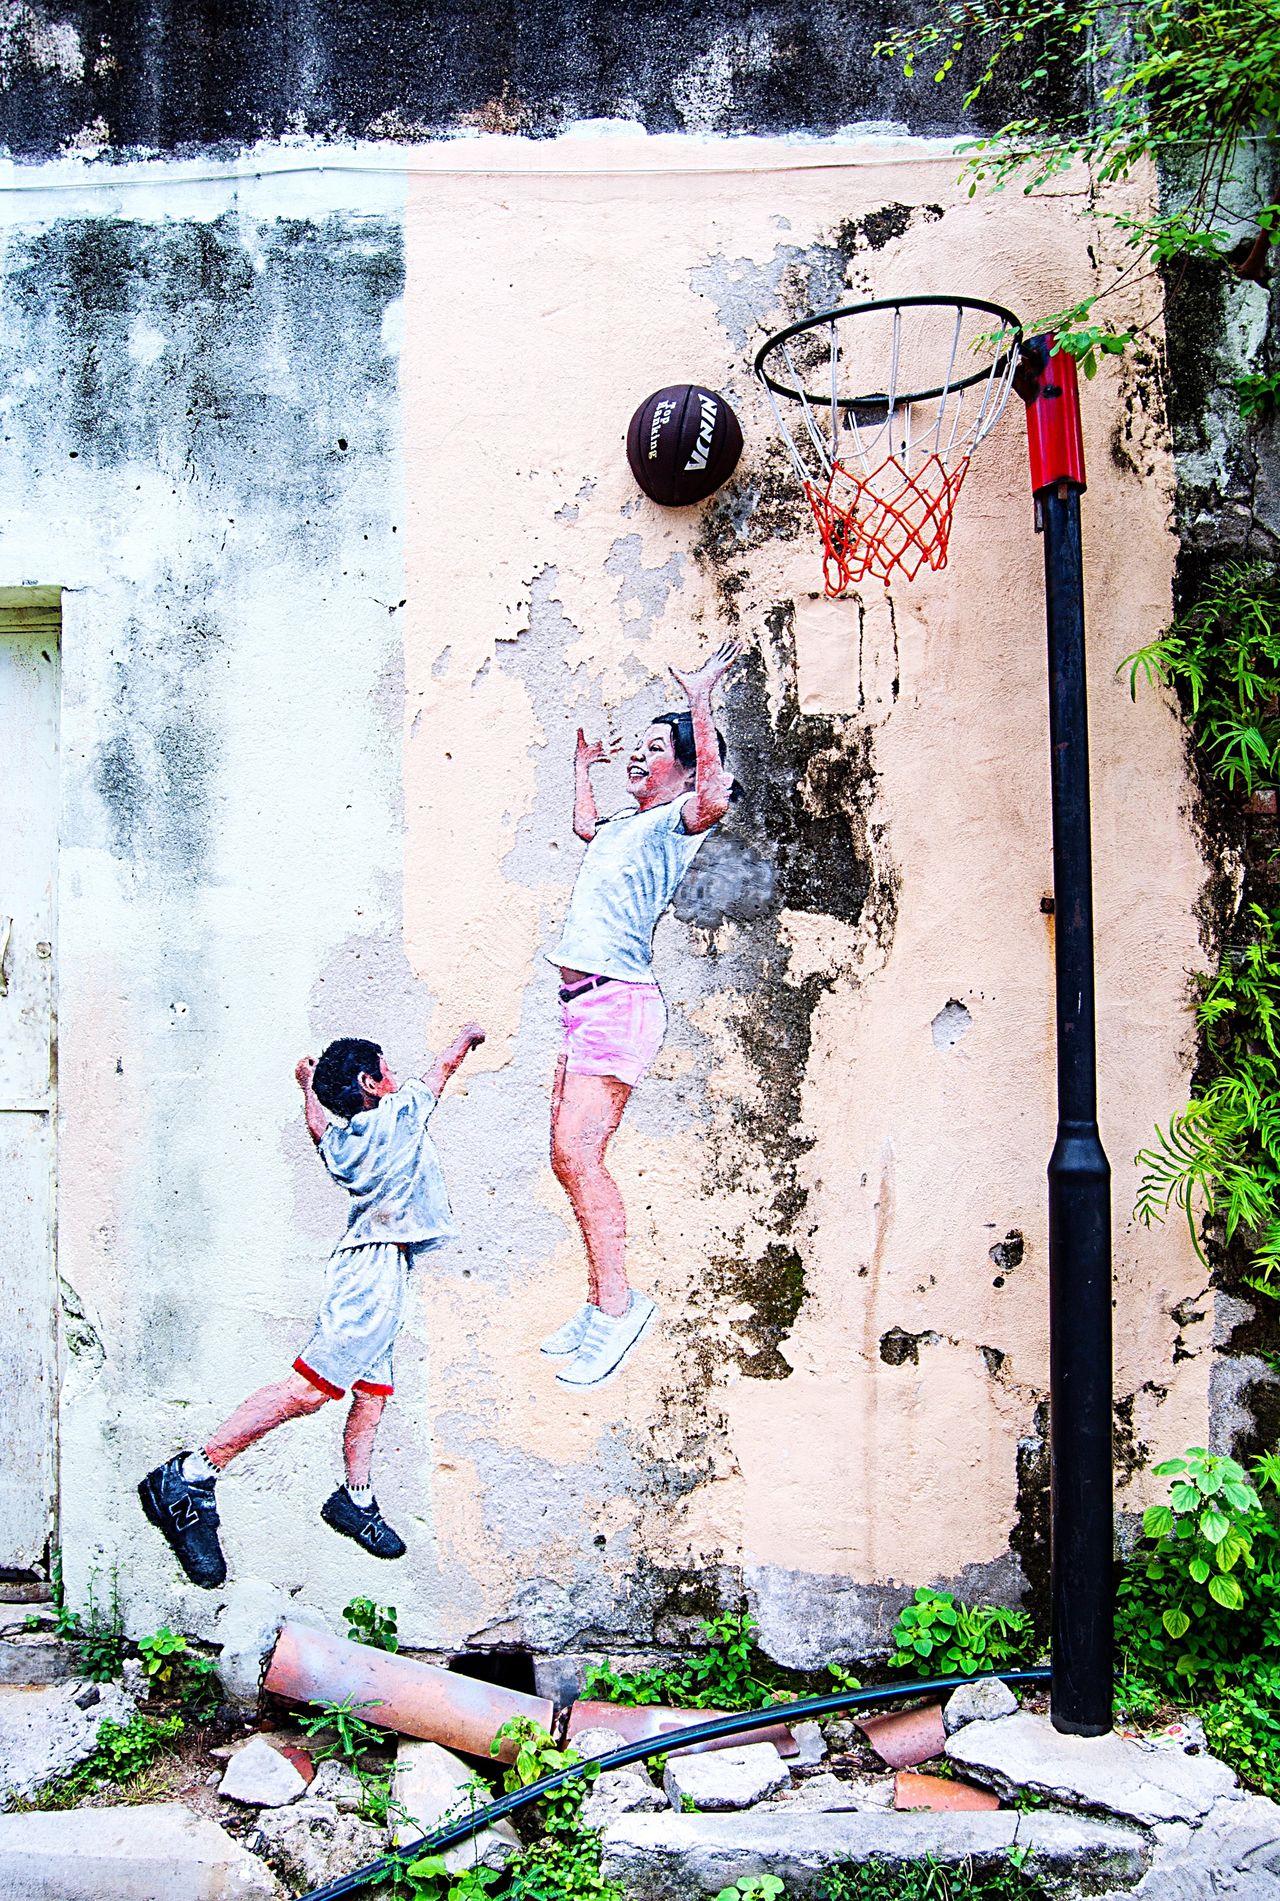 Street Art Sport Basketball Authentic Colorful Georgetown Malaysia Penang Southeastasia Asian  Day Travel Contemporary Culture Art Streetart Graffiti Wall Graffiti Art Wall Art Graffiti Mixedmedia Kids Boy Girl Sport